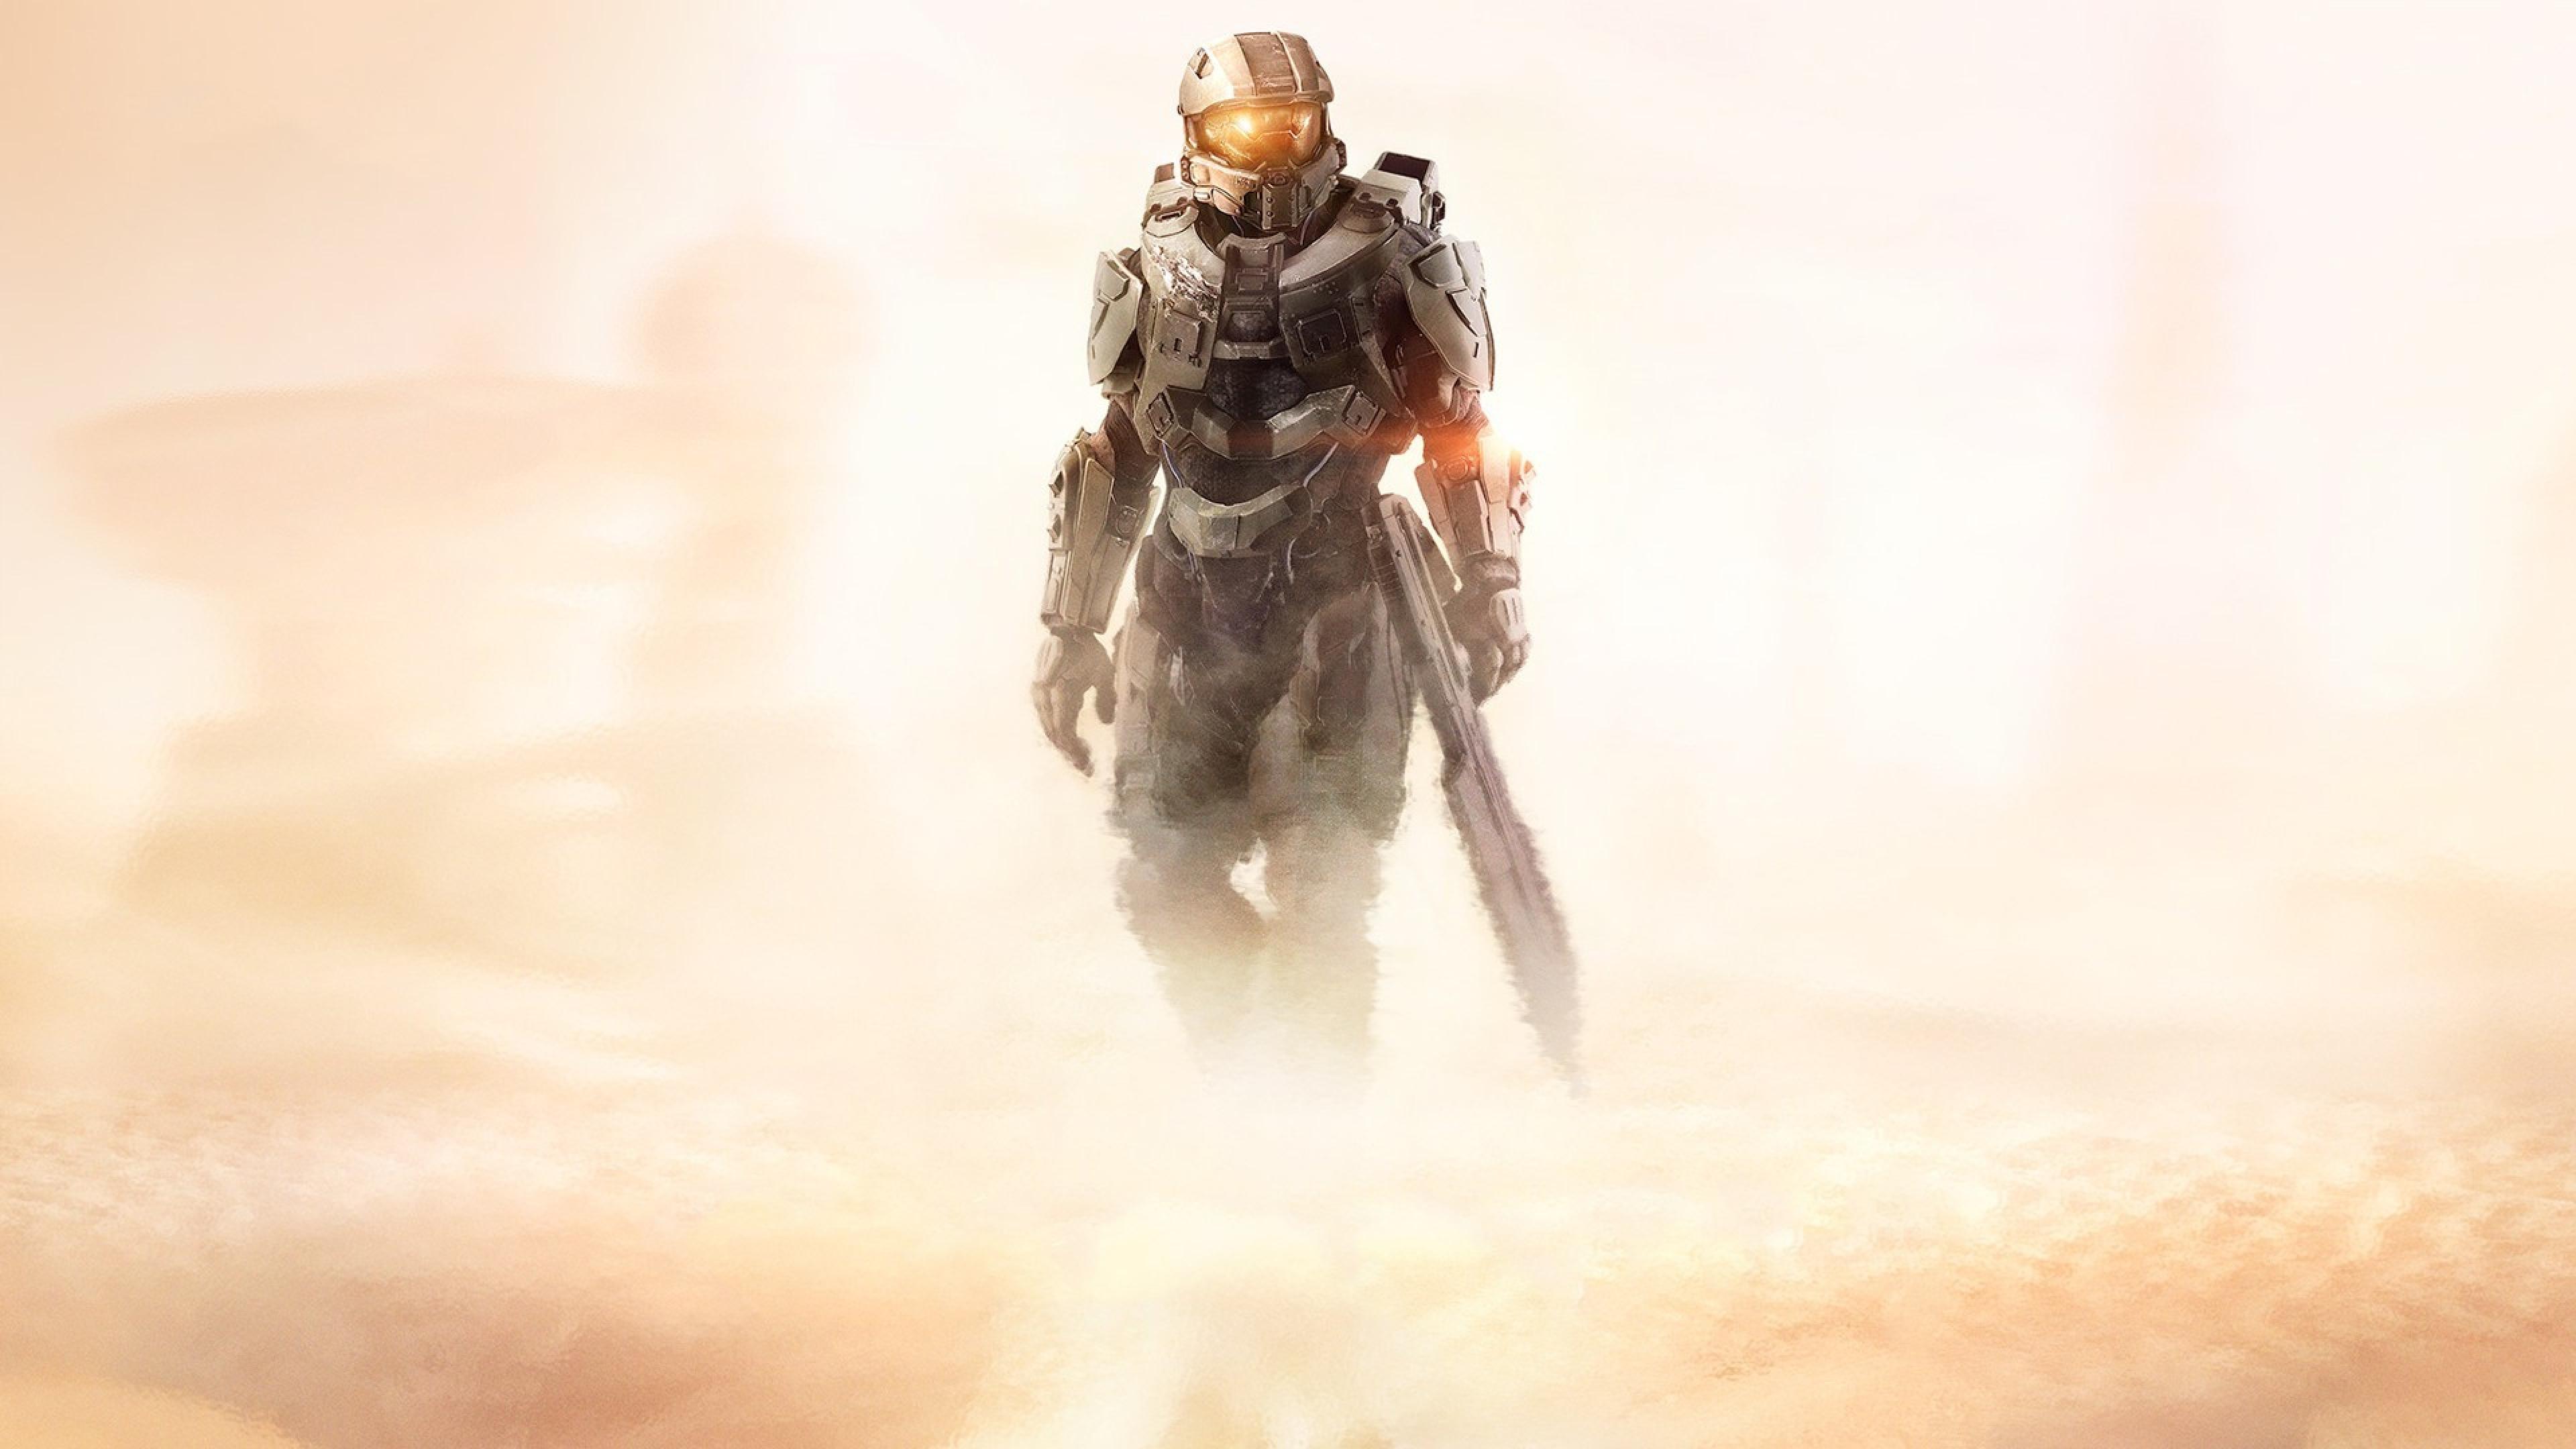 Halo 5 wallpapers - SF Wallpaper